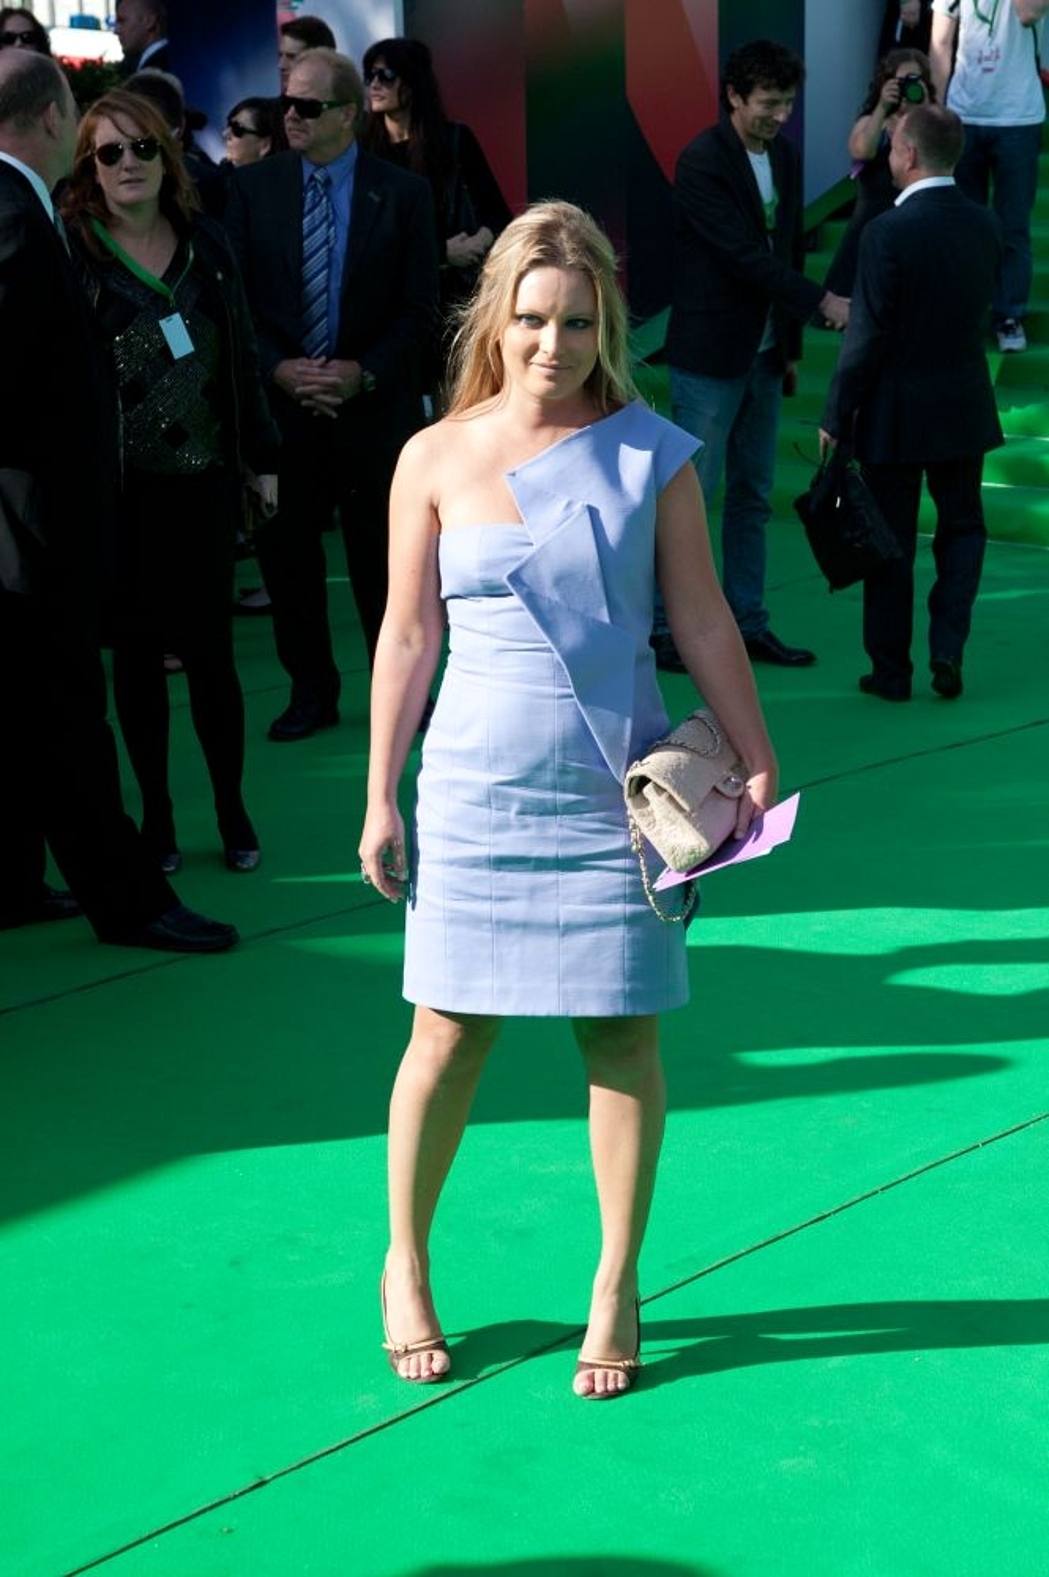 Feet Dana Borisova nudes (61 foto and video), Tits, Paparazzi, Twitter, legs 2020